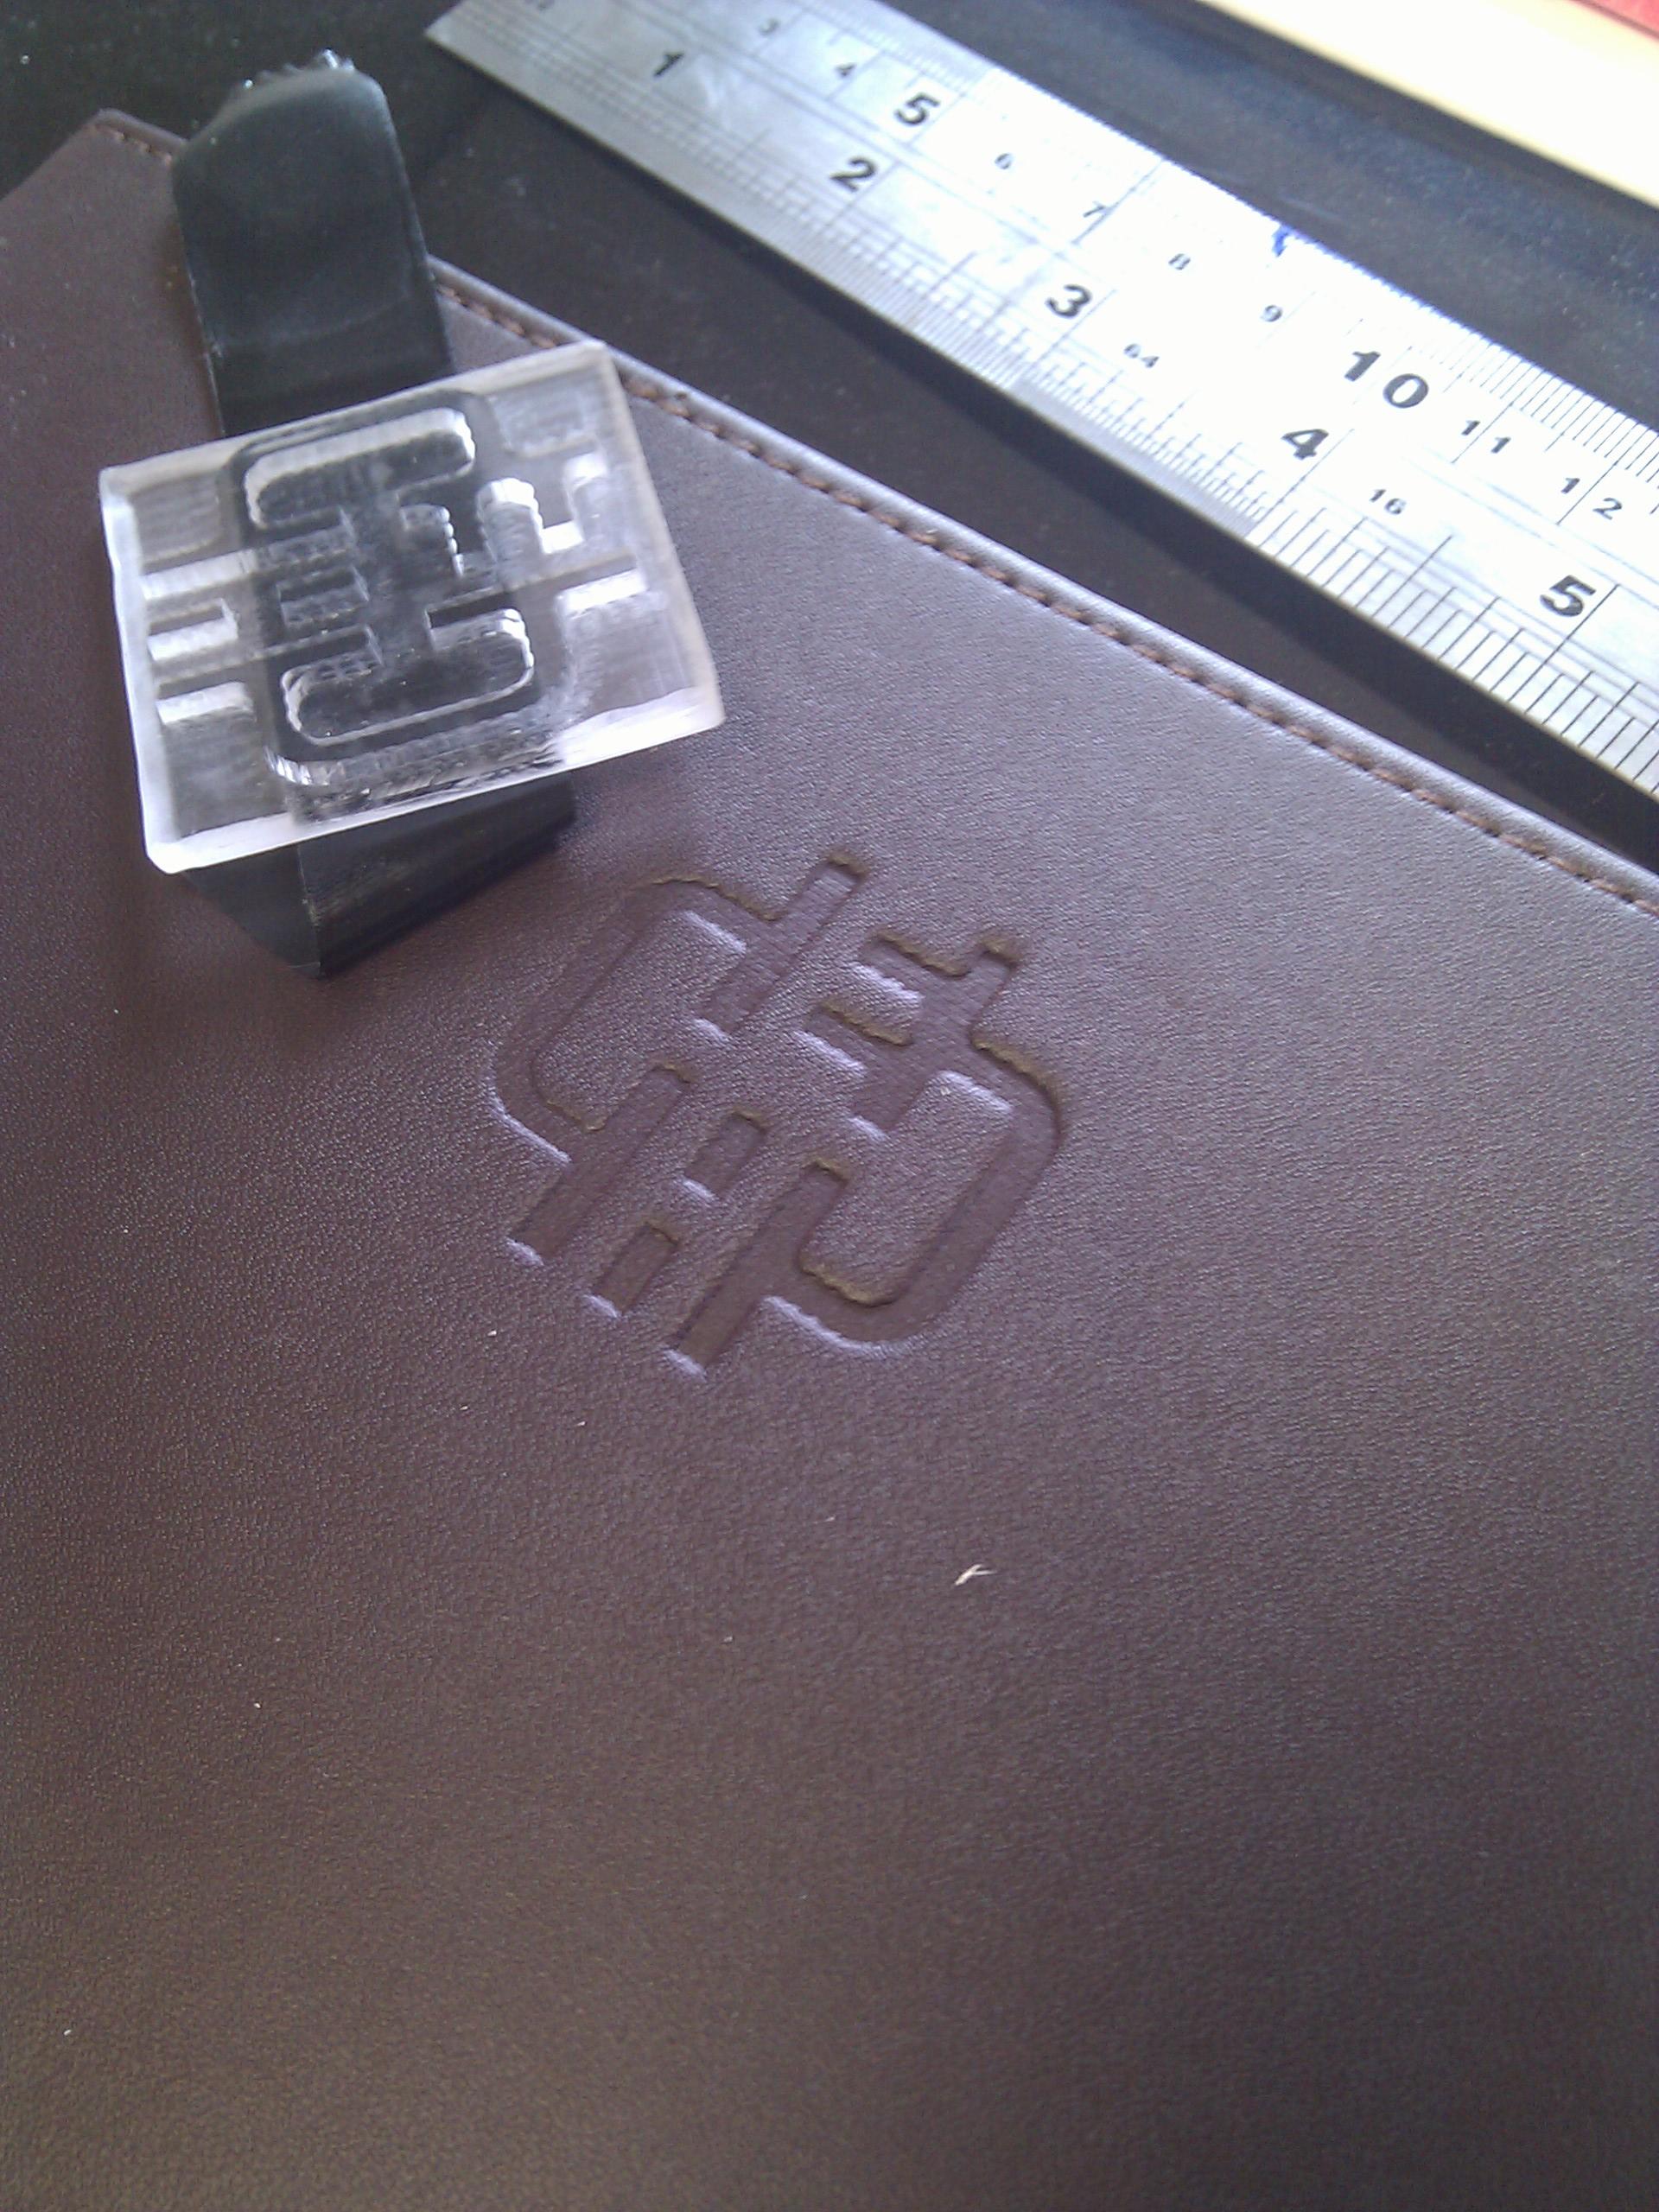 Debossing (embossing / letterpress)